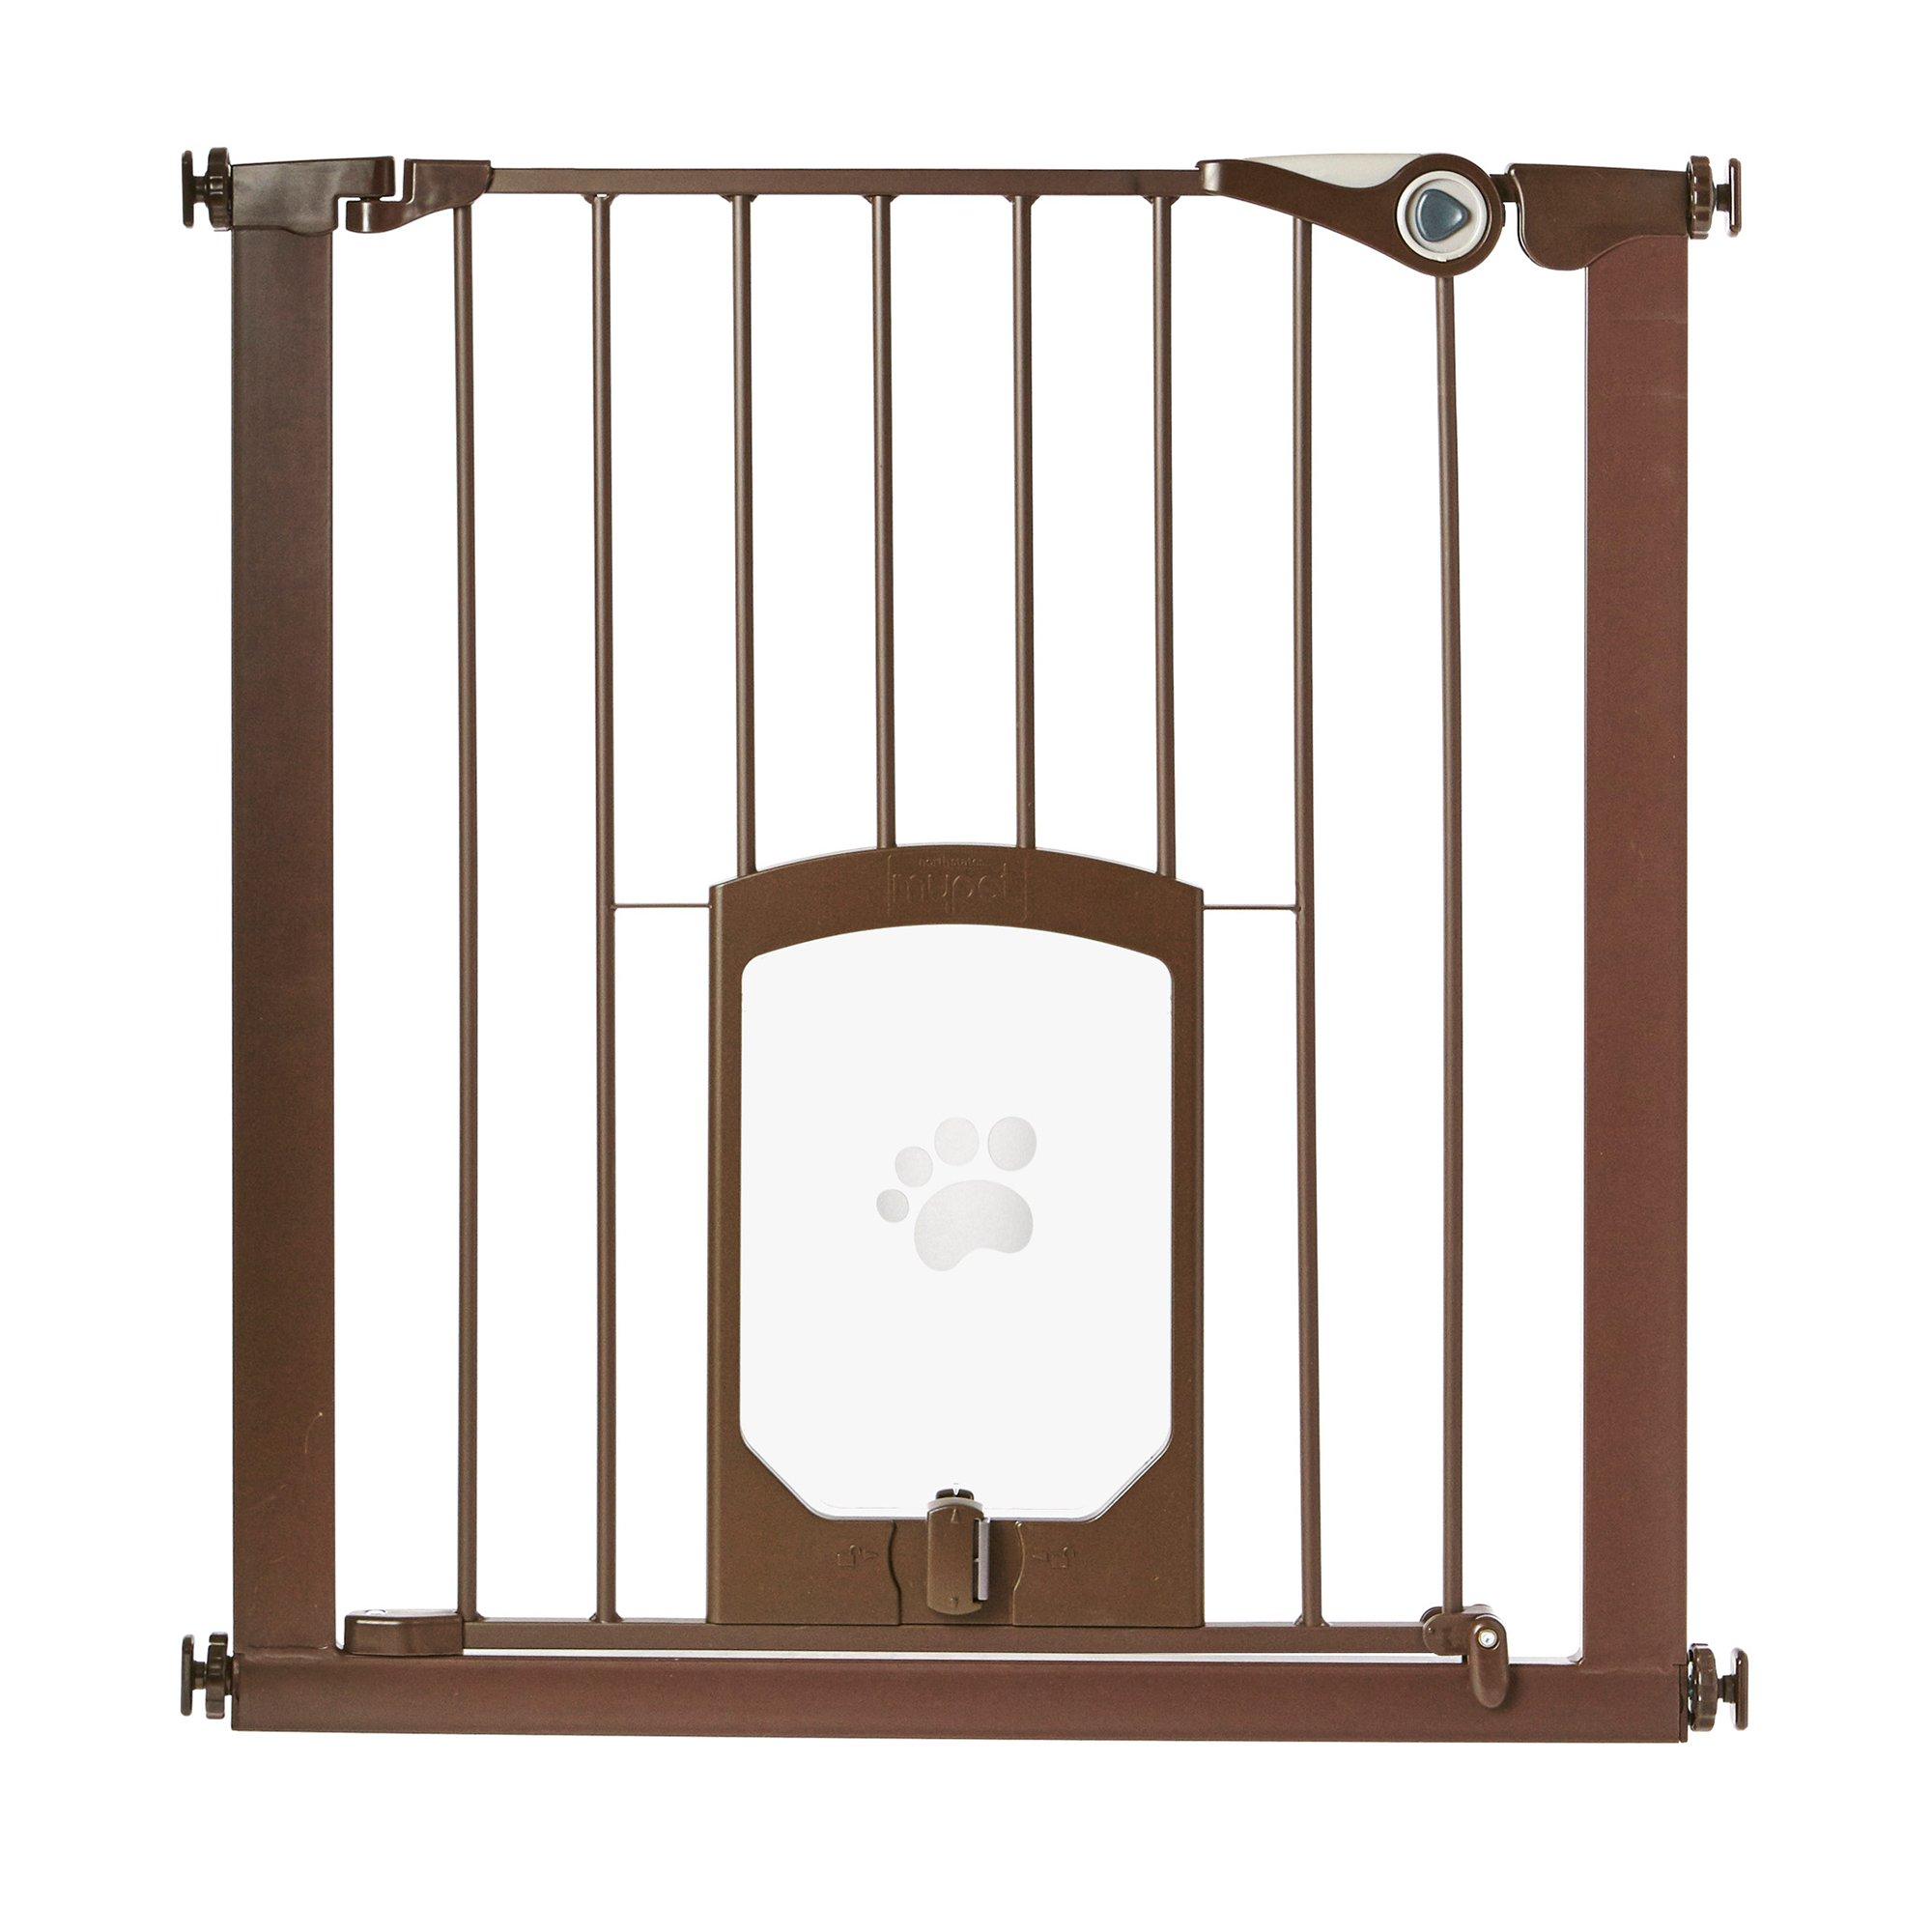 North States Petgate Passage Gate  sc 1 st  Petco & Cat Gates \u0026 Doors: Cat Barriers \u0026 Containment for the Home | Petco